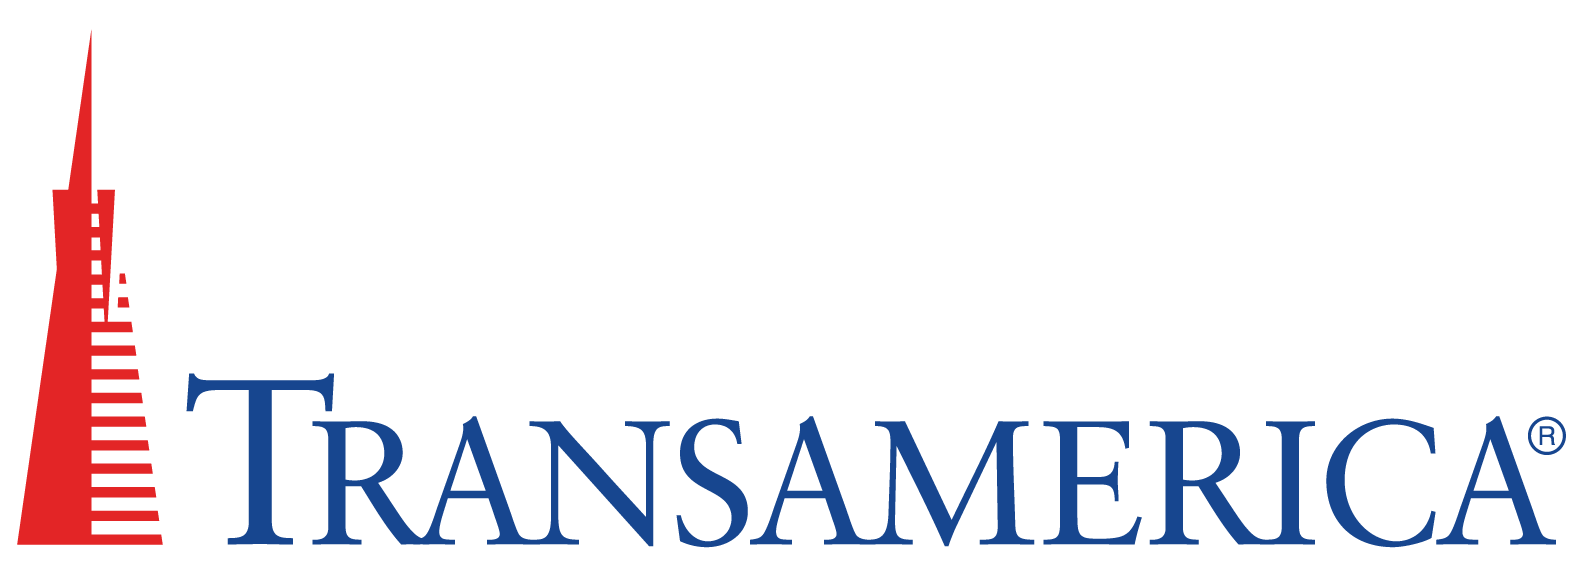 Transamerica-FanCompass Sponsor.png